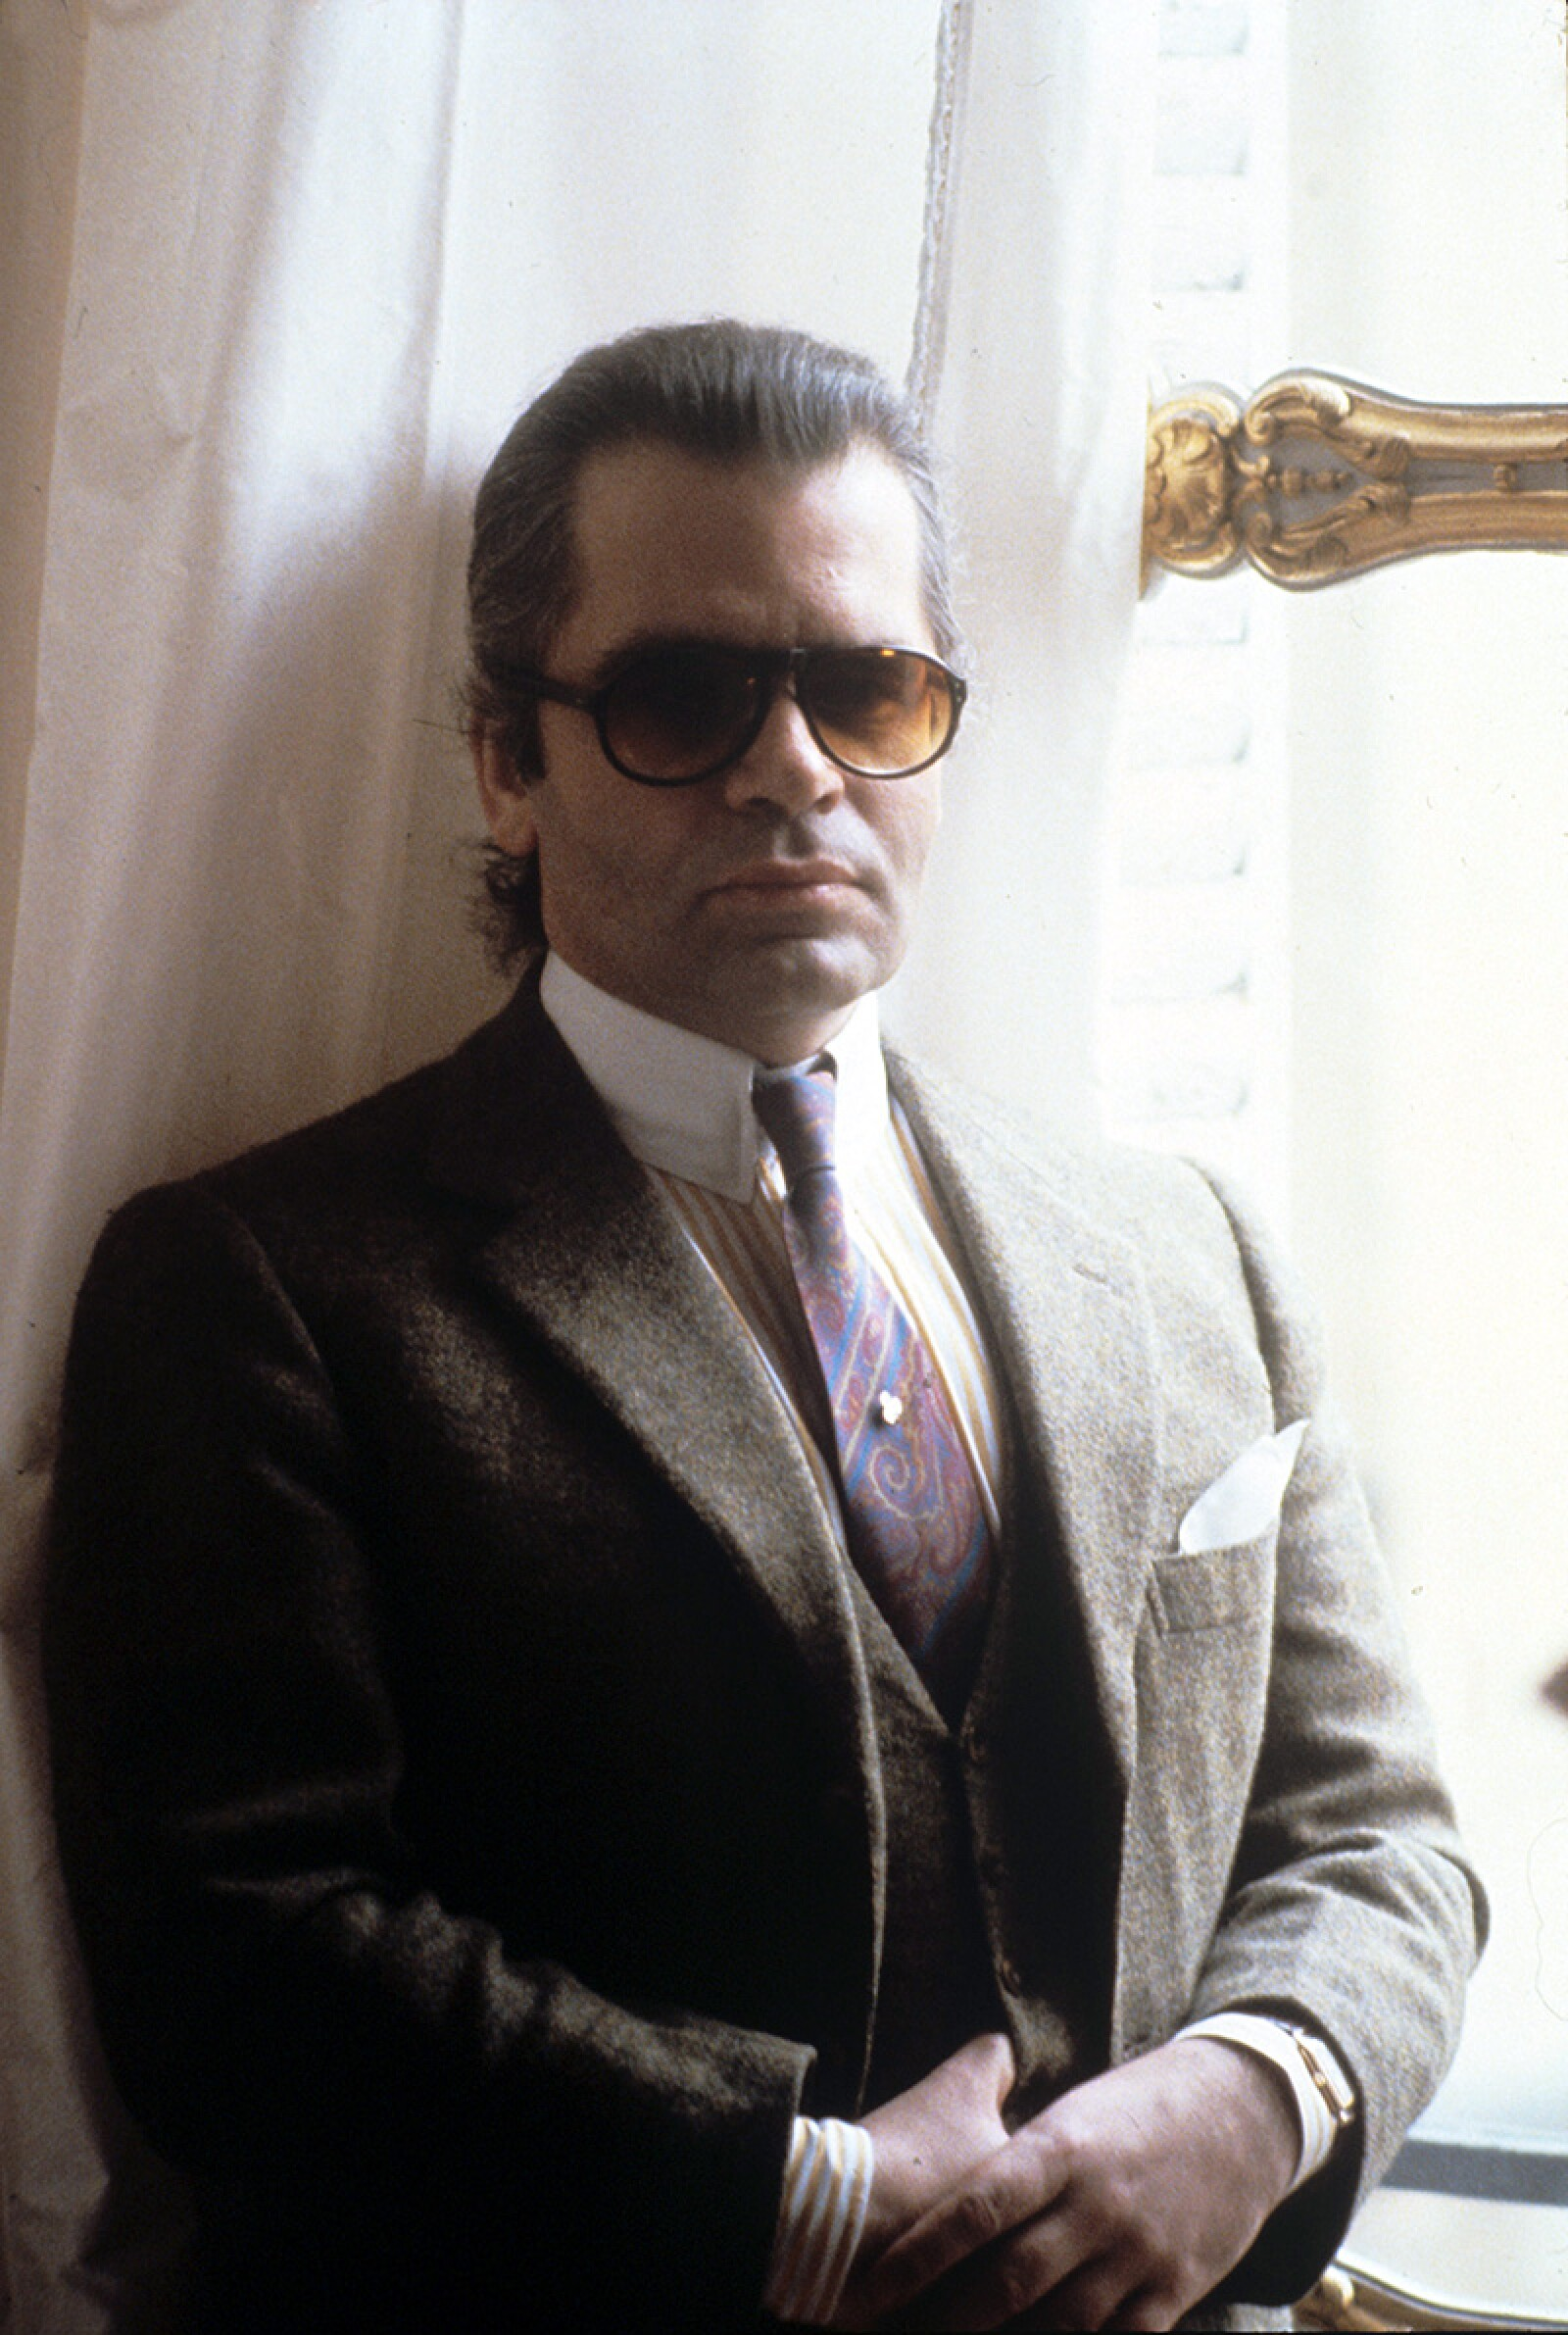 Karl Lagerfeld - 1982